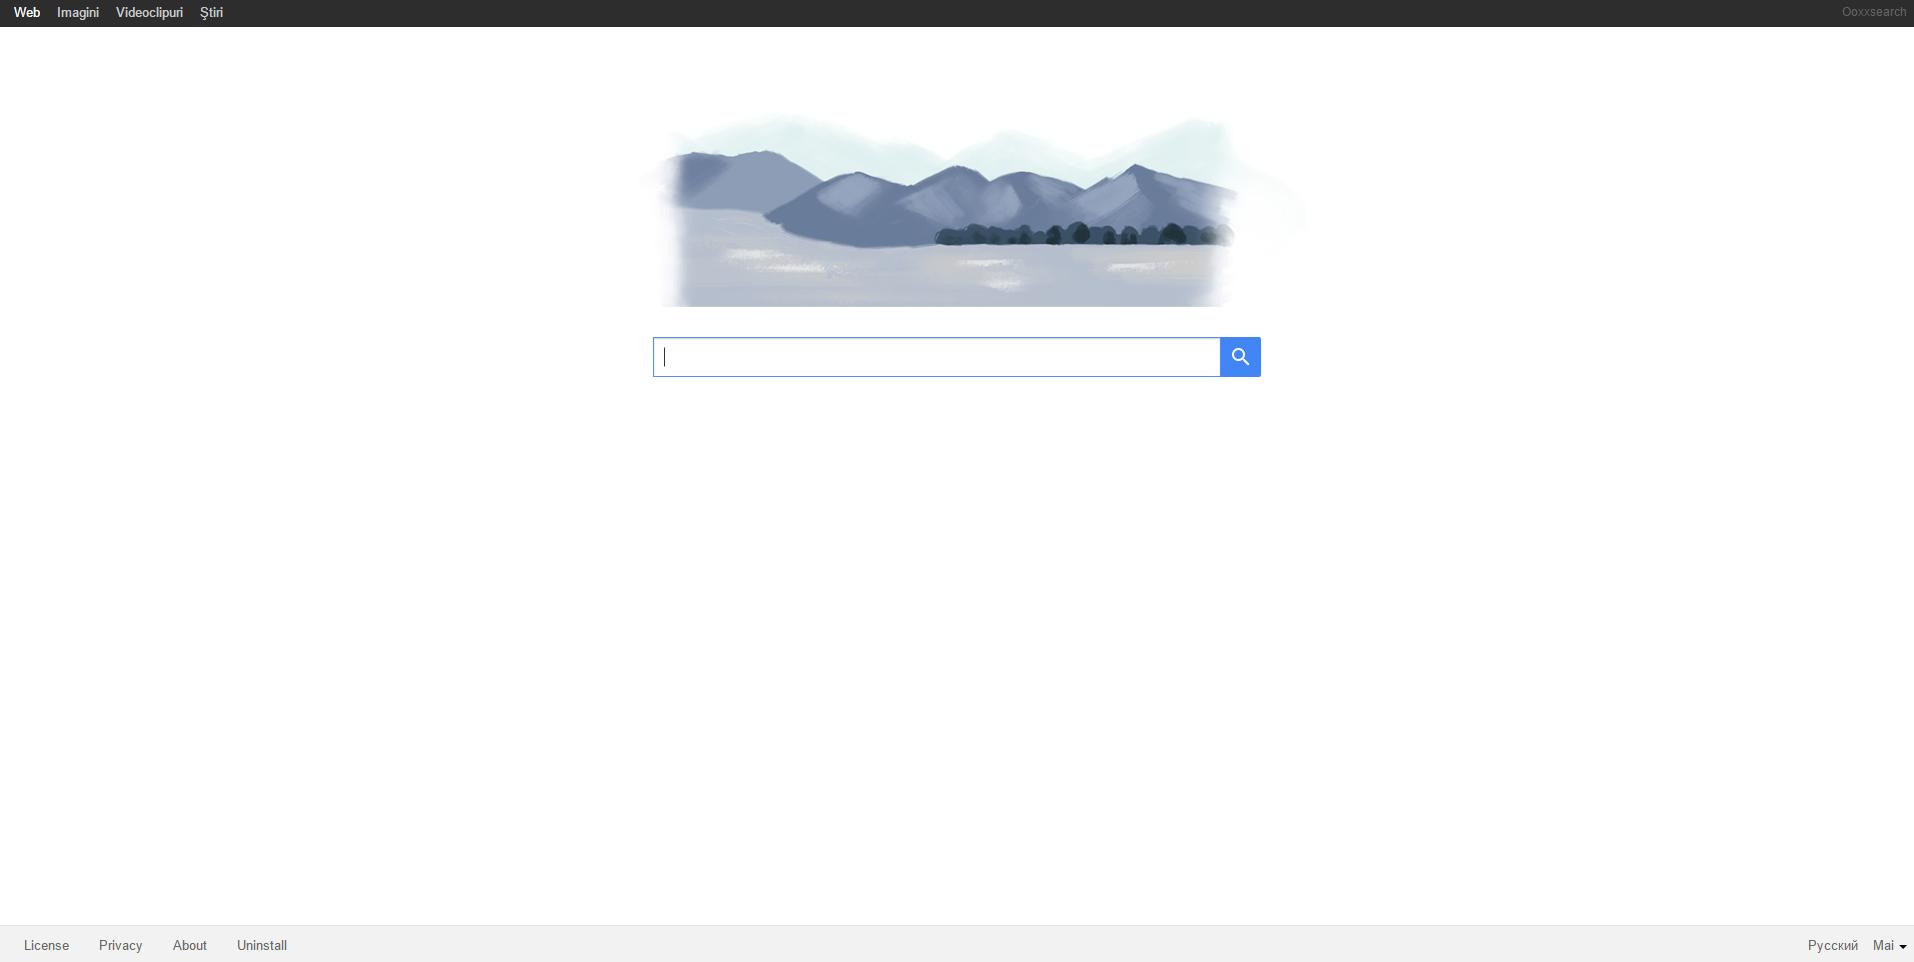 Ooxxsearch.com Ads